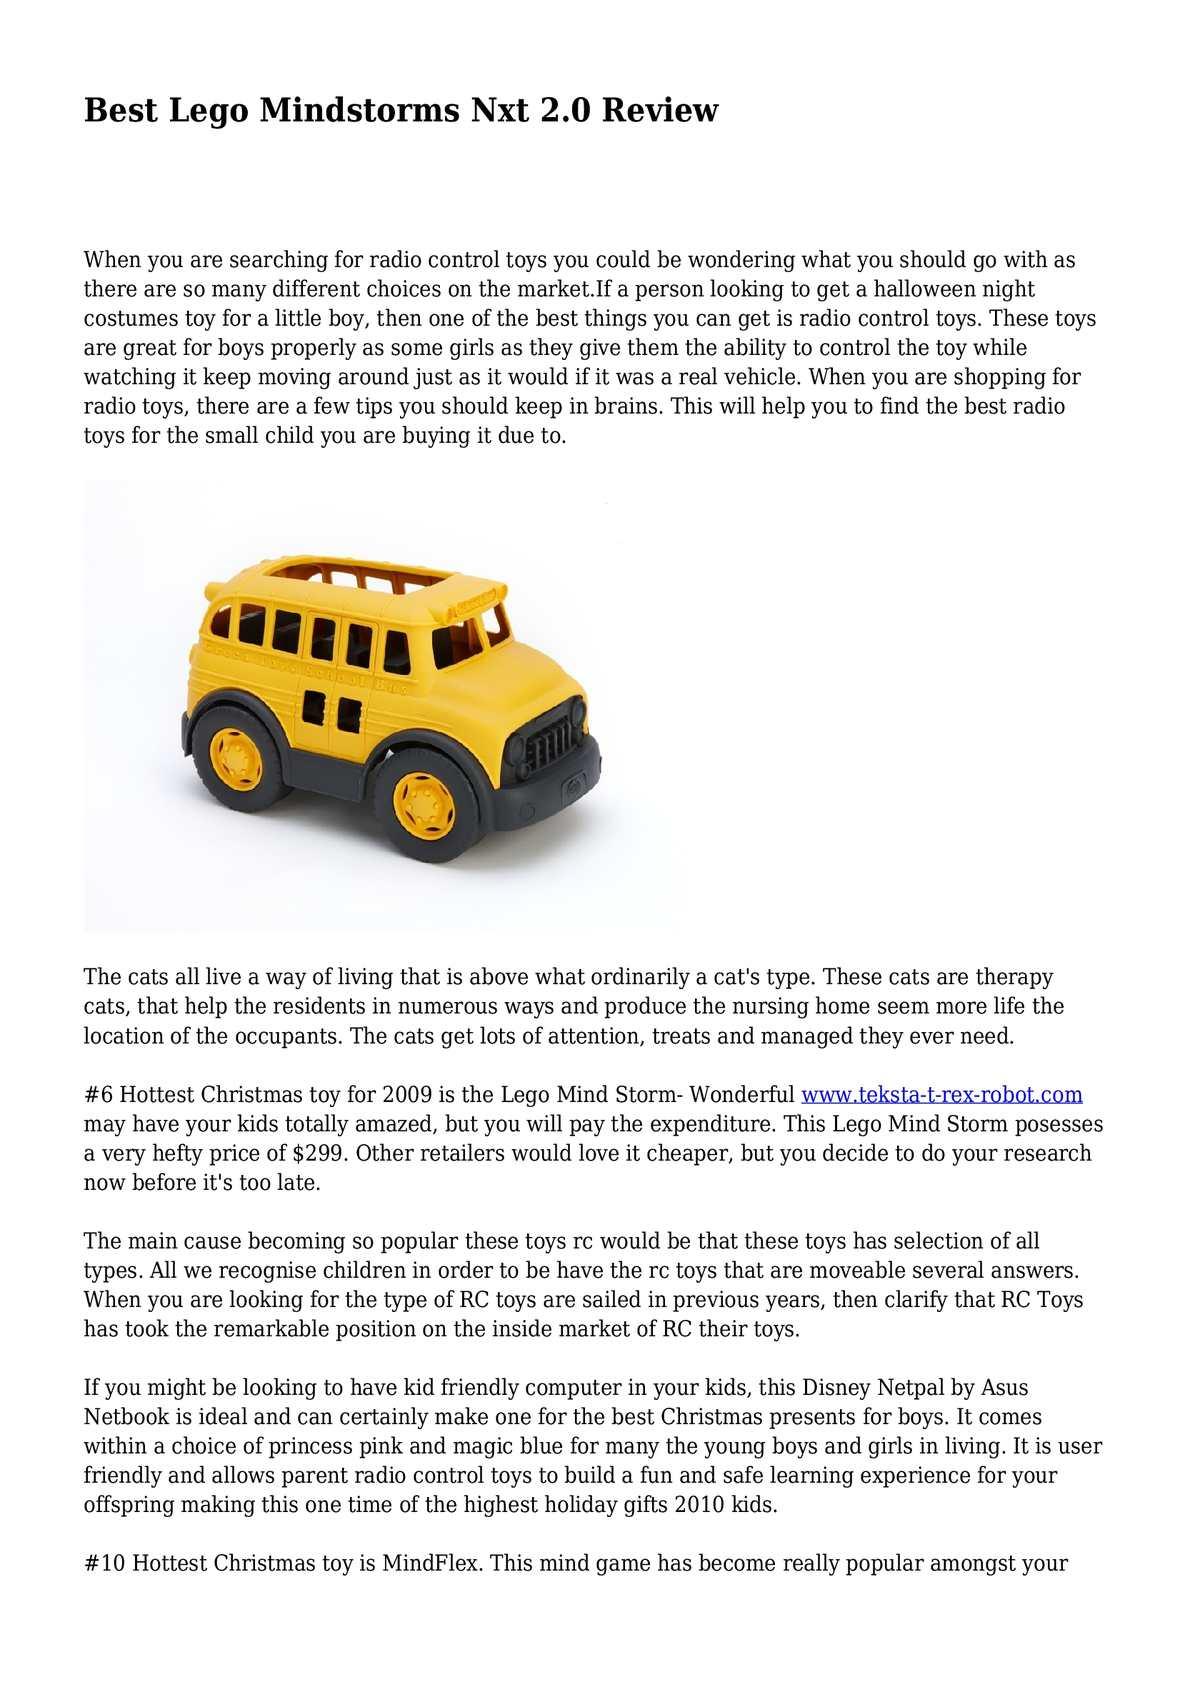 Calaméo - Best Lego Mindstorms Nxt 2.0 Review